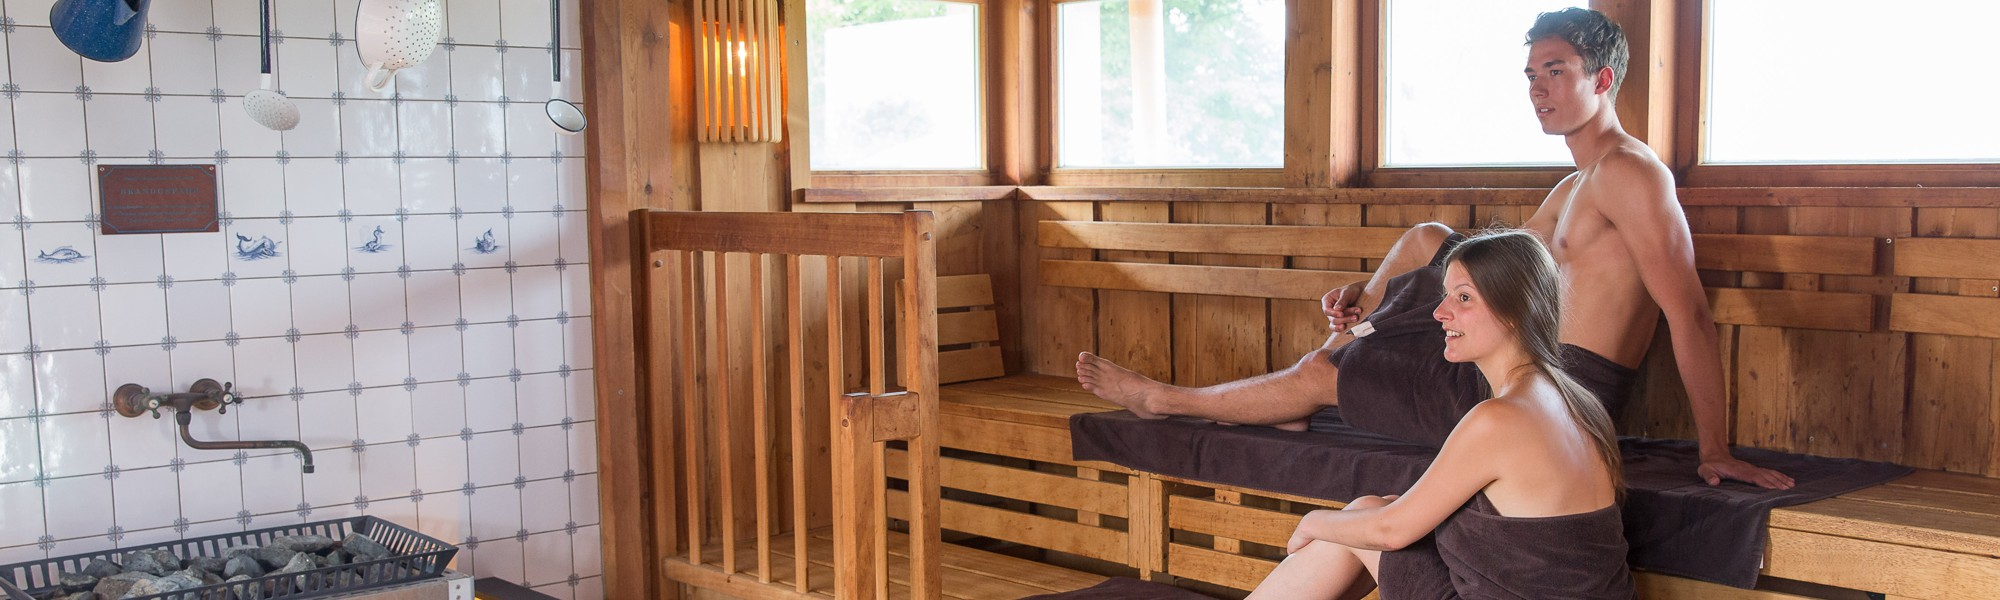 Sauna im BadeWerk Neuharlingersiel